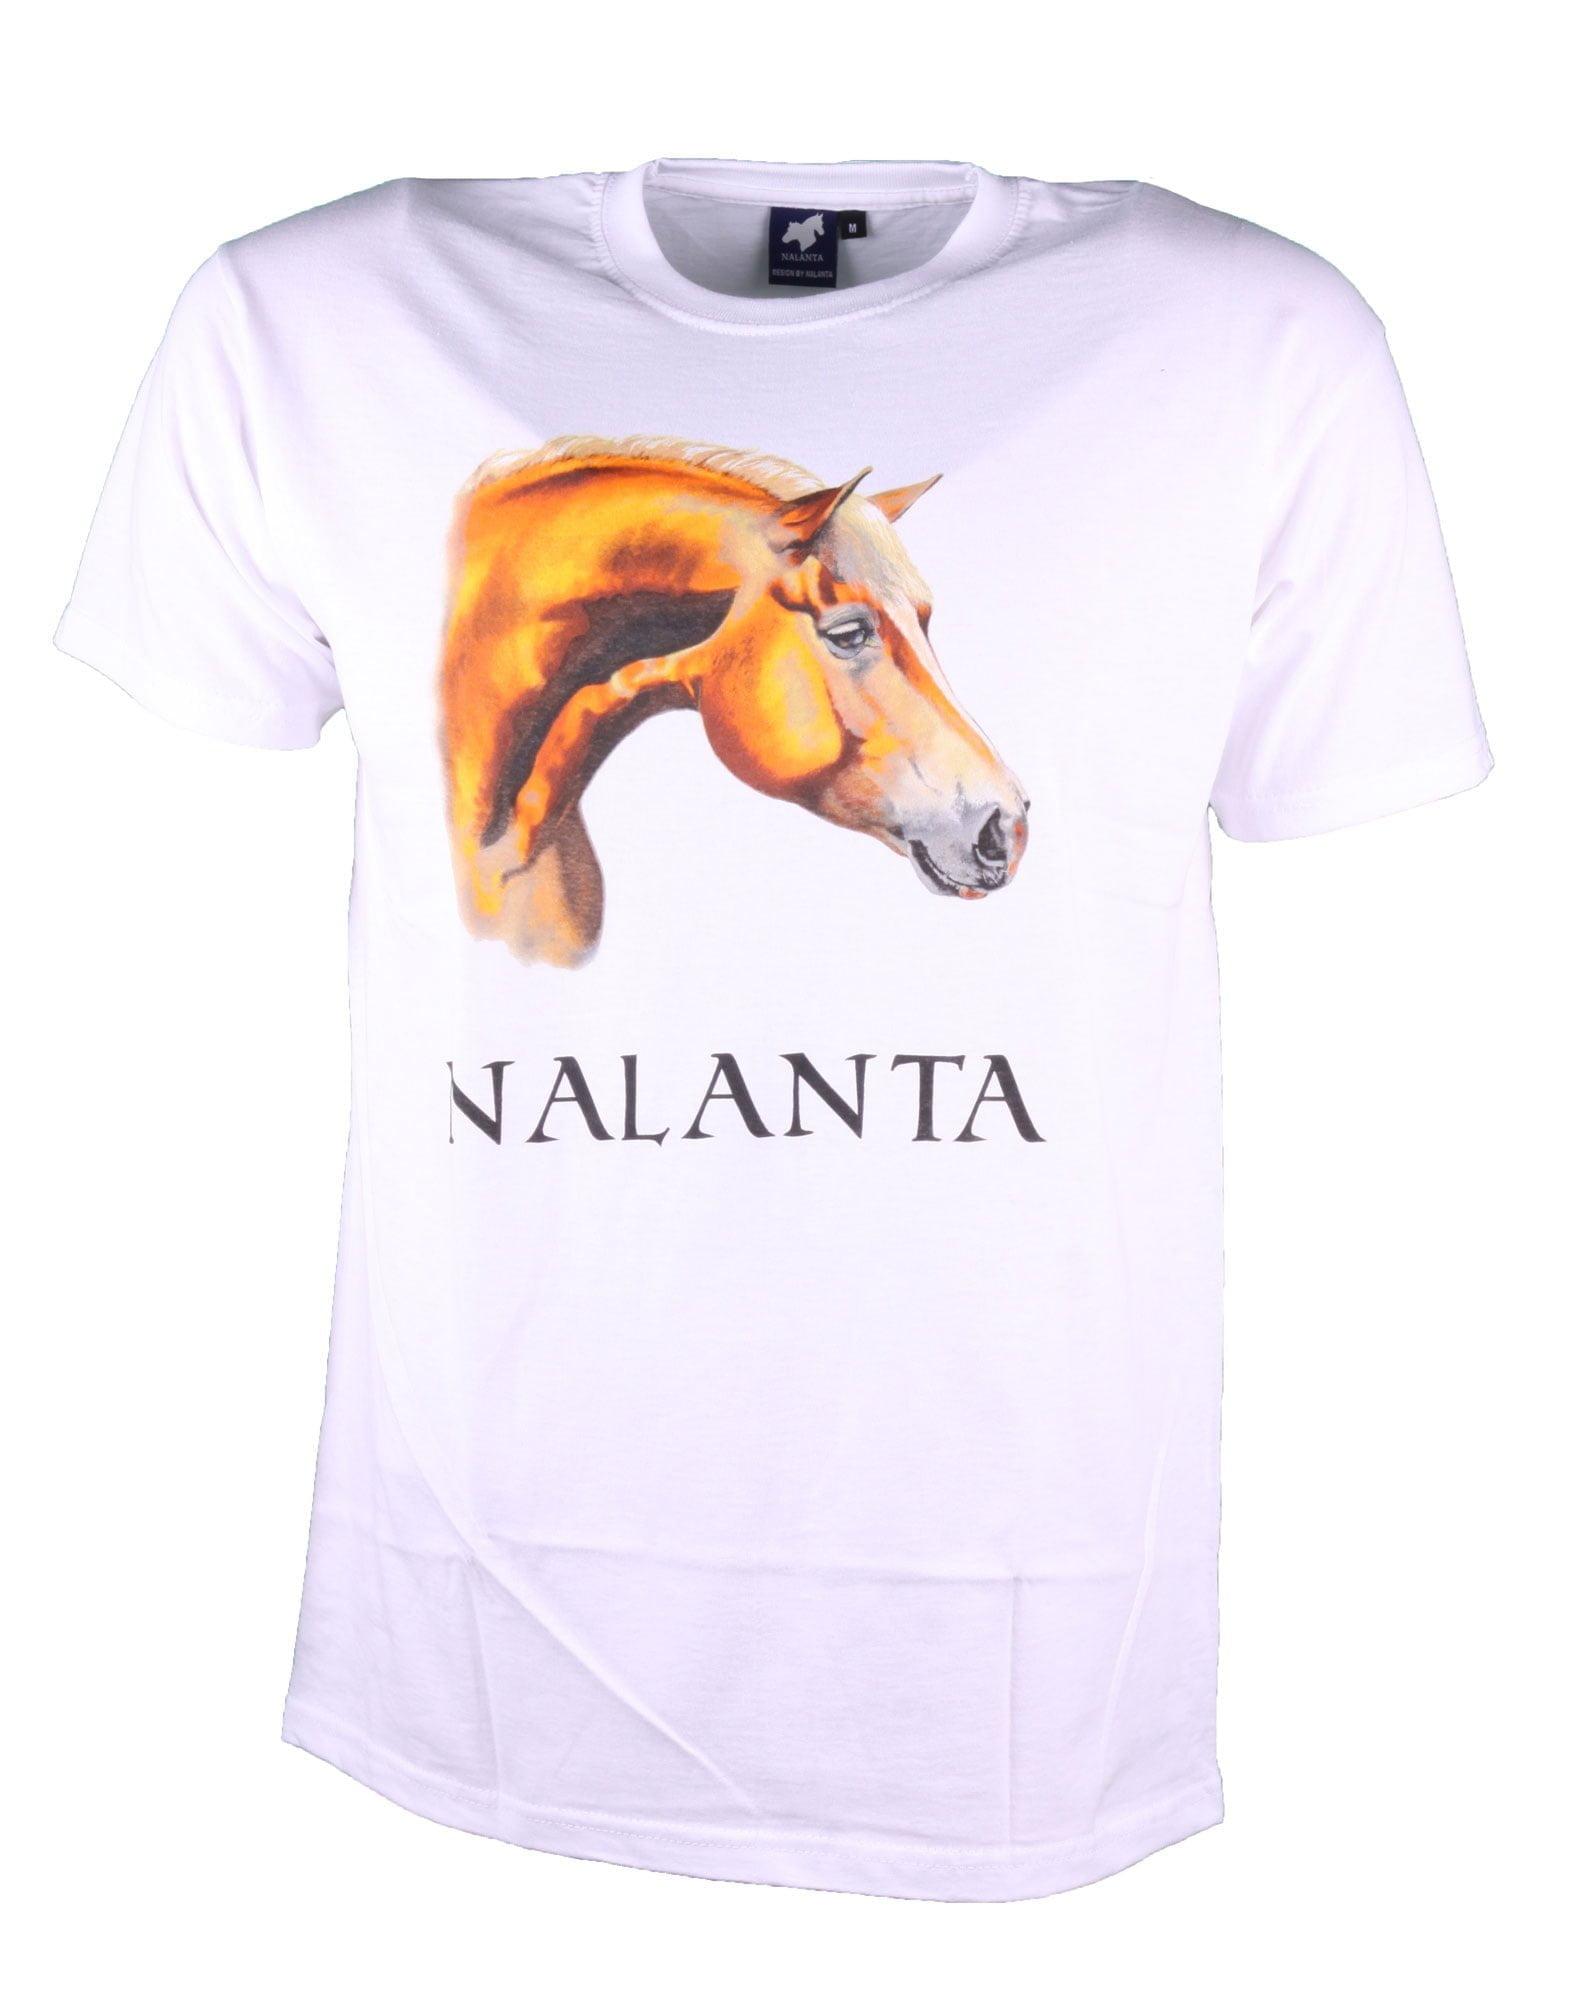 Men t-shirt (4 options)